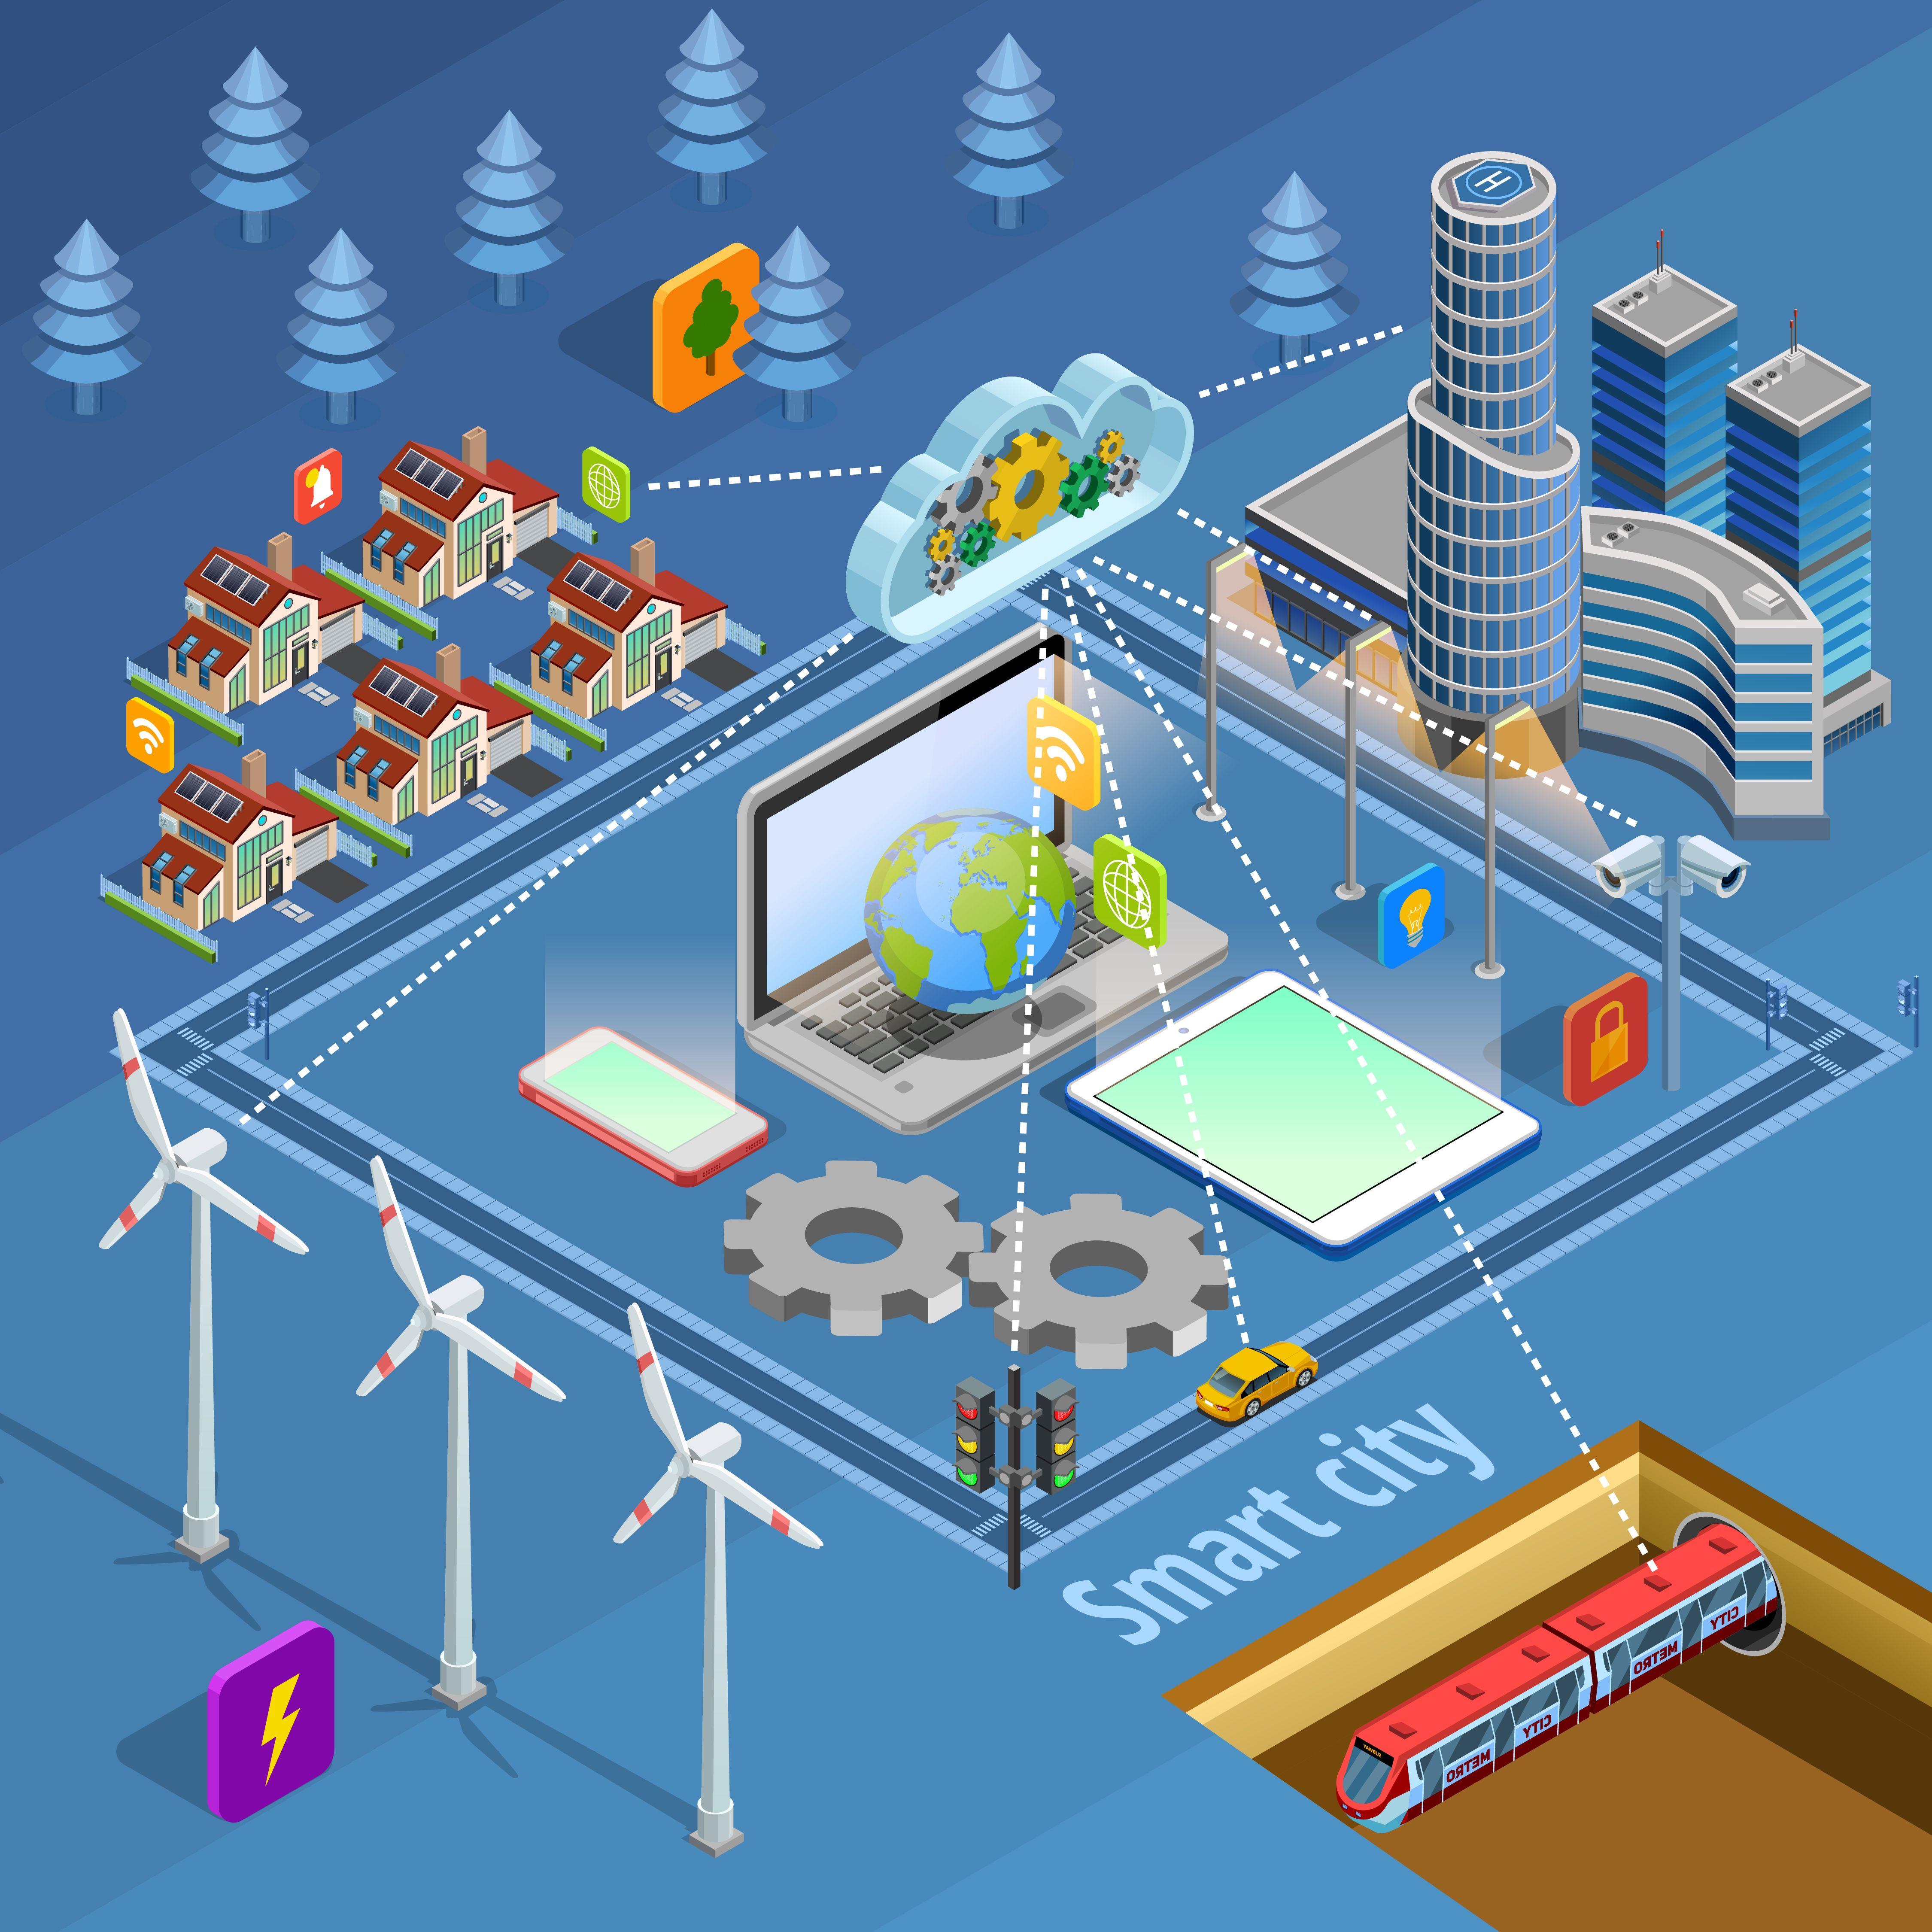 Pin on Smart City